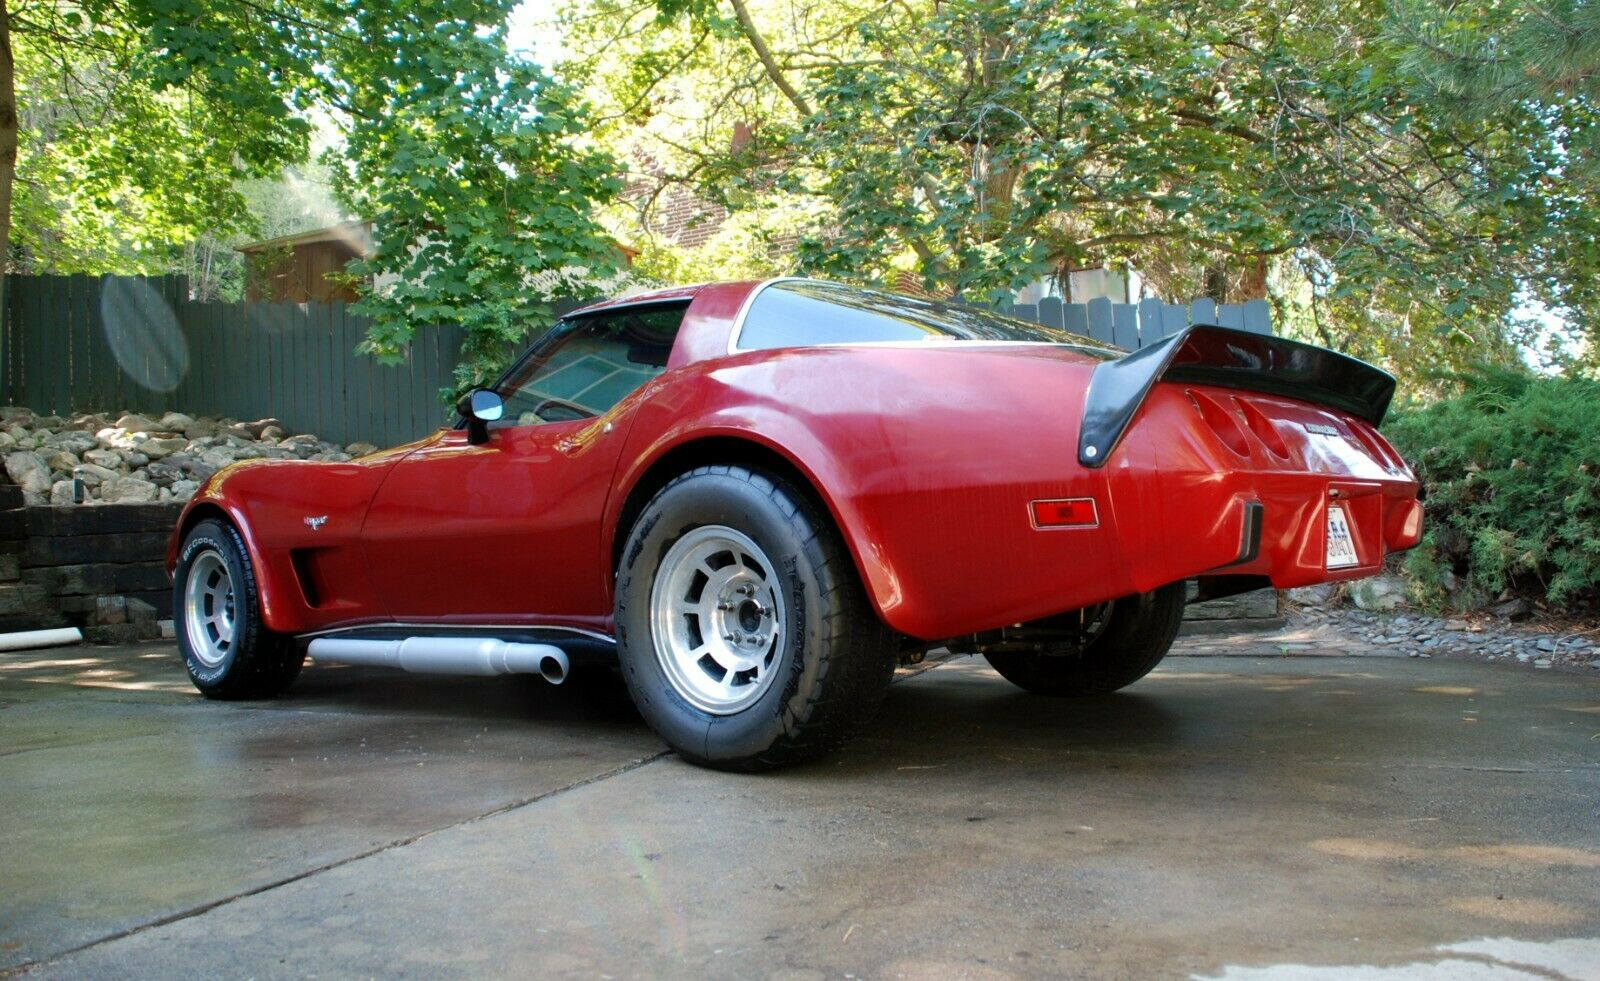 1978 Red Chevrolet Corvette     C3 Corvette Photo 1